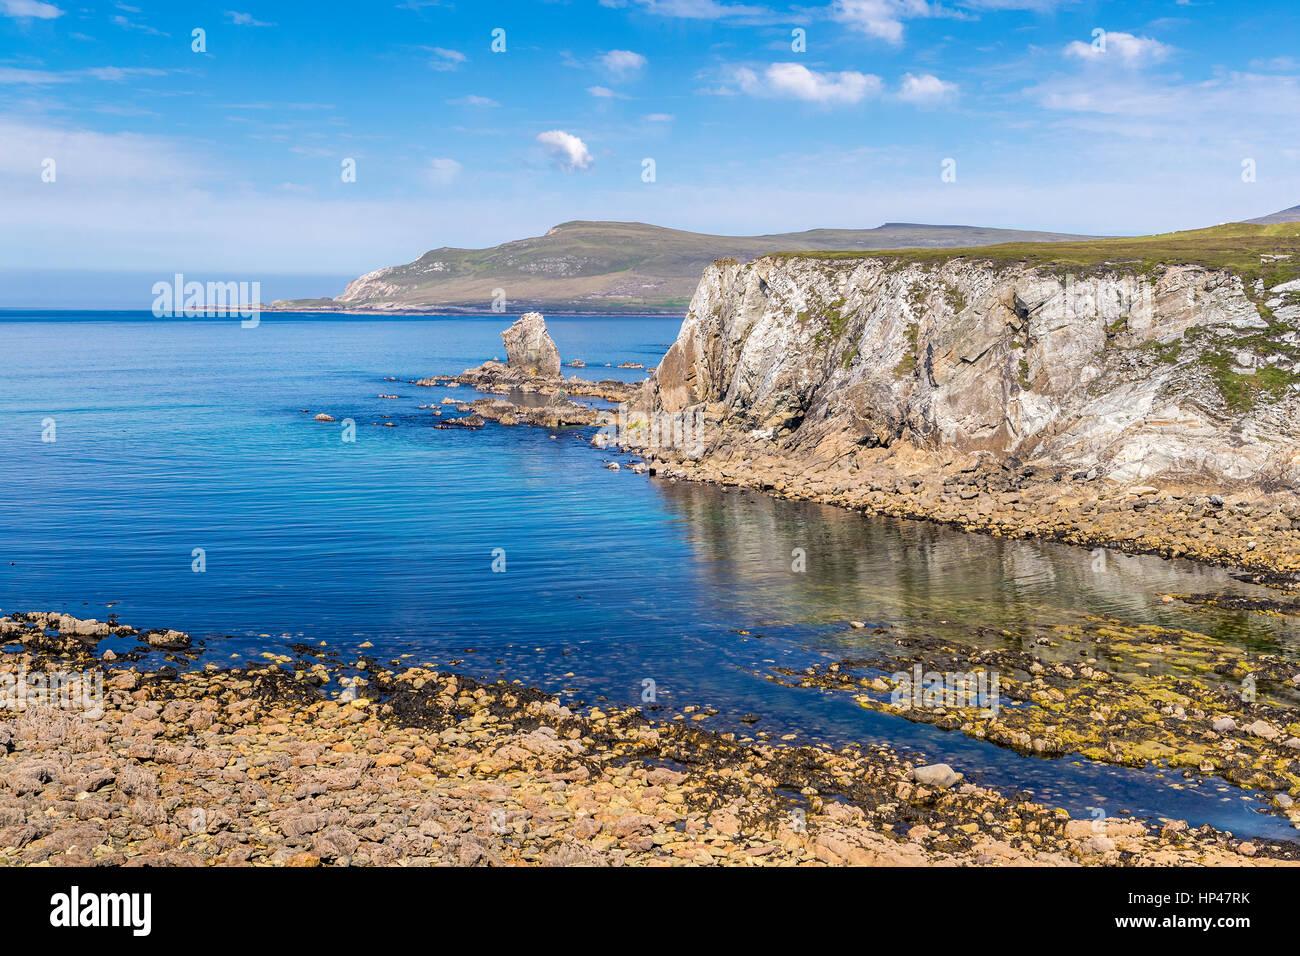 Ashleam Bay seen from Wild Atlantic Way, Achill Island, County Mayo, Ireland, Europe. - Stock Image